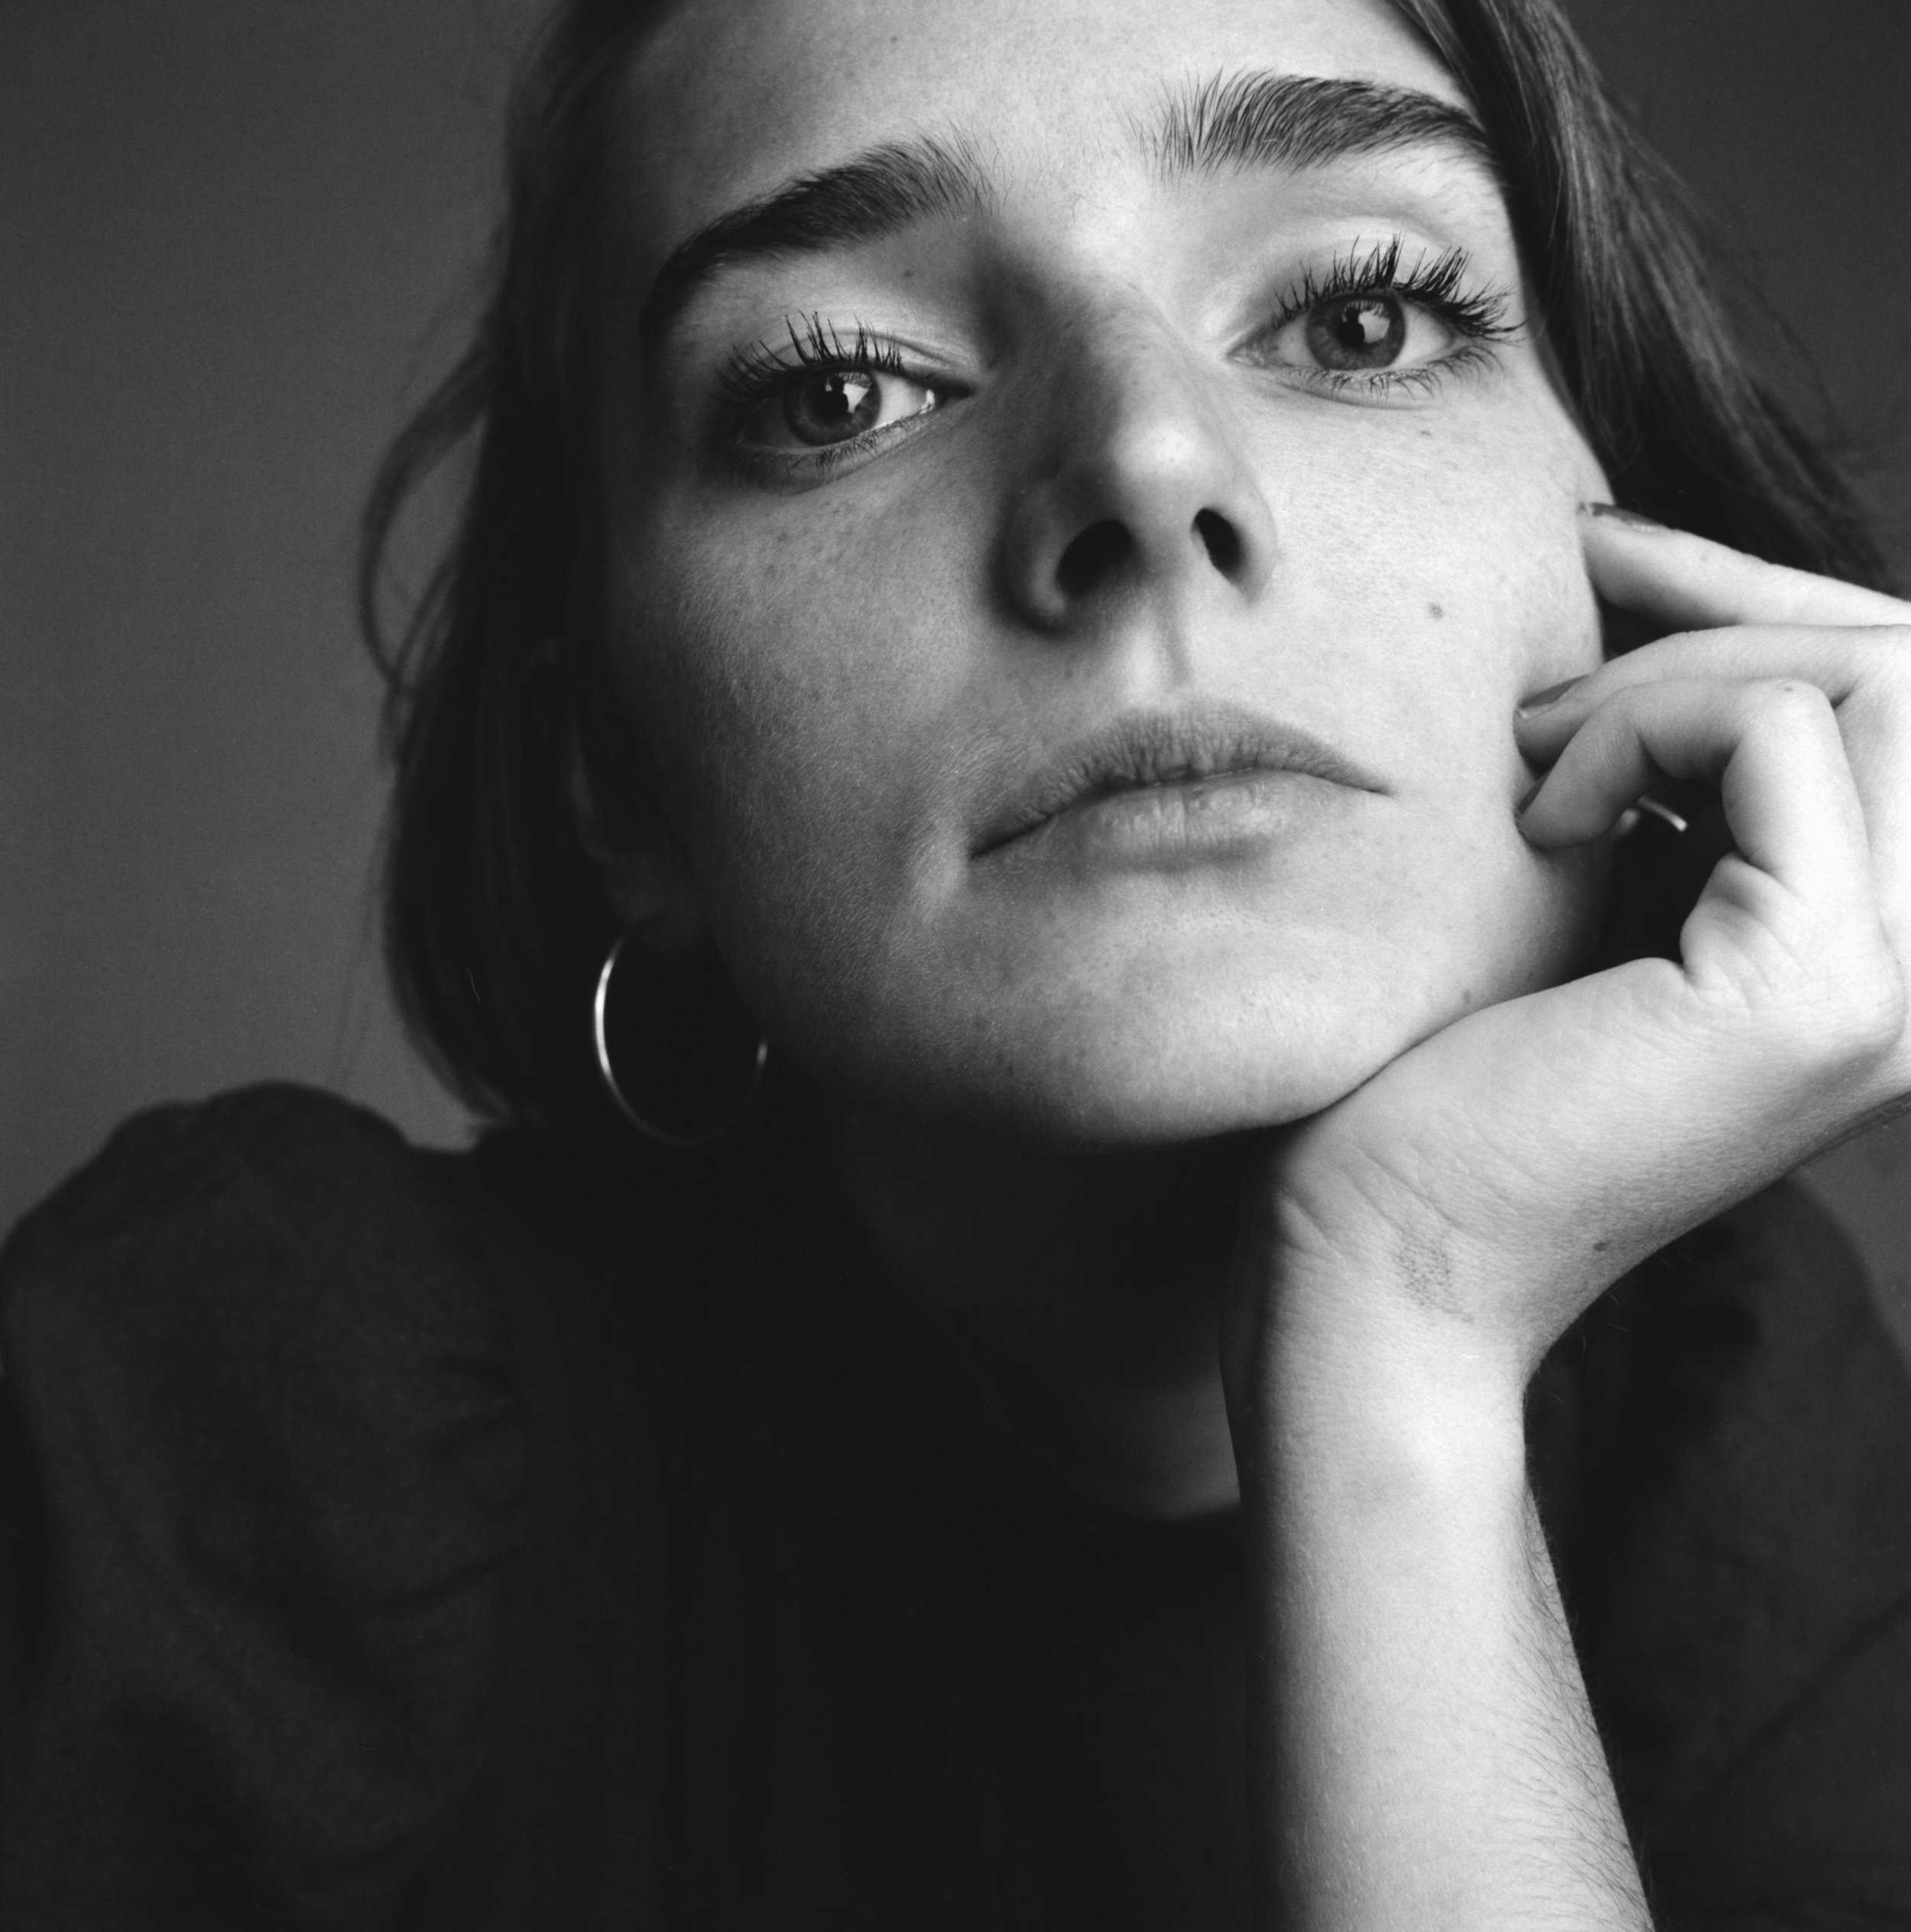 Katya_Z_b_2019 8.jpg